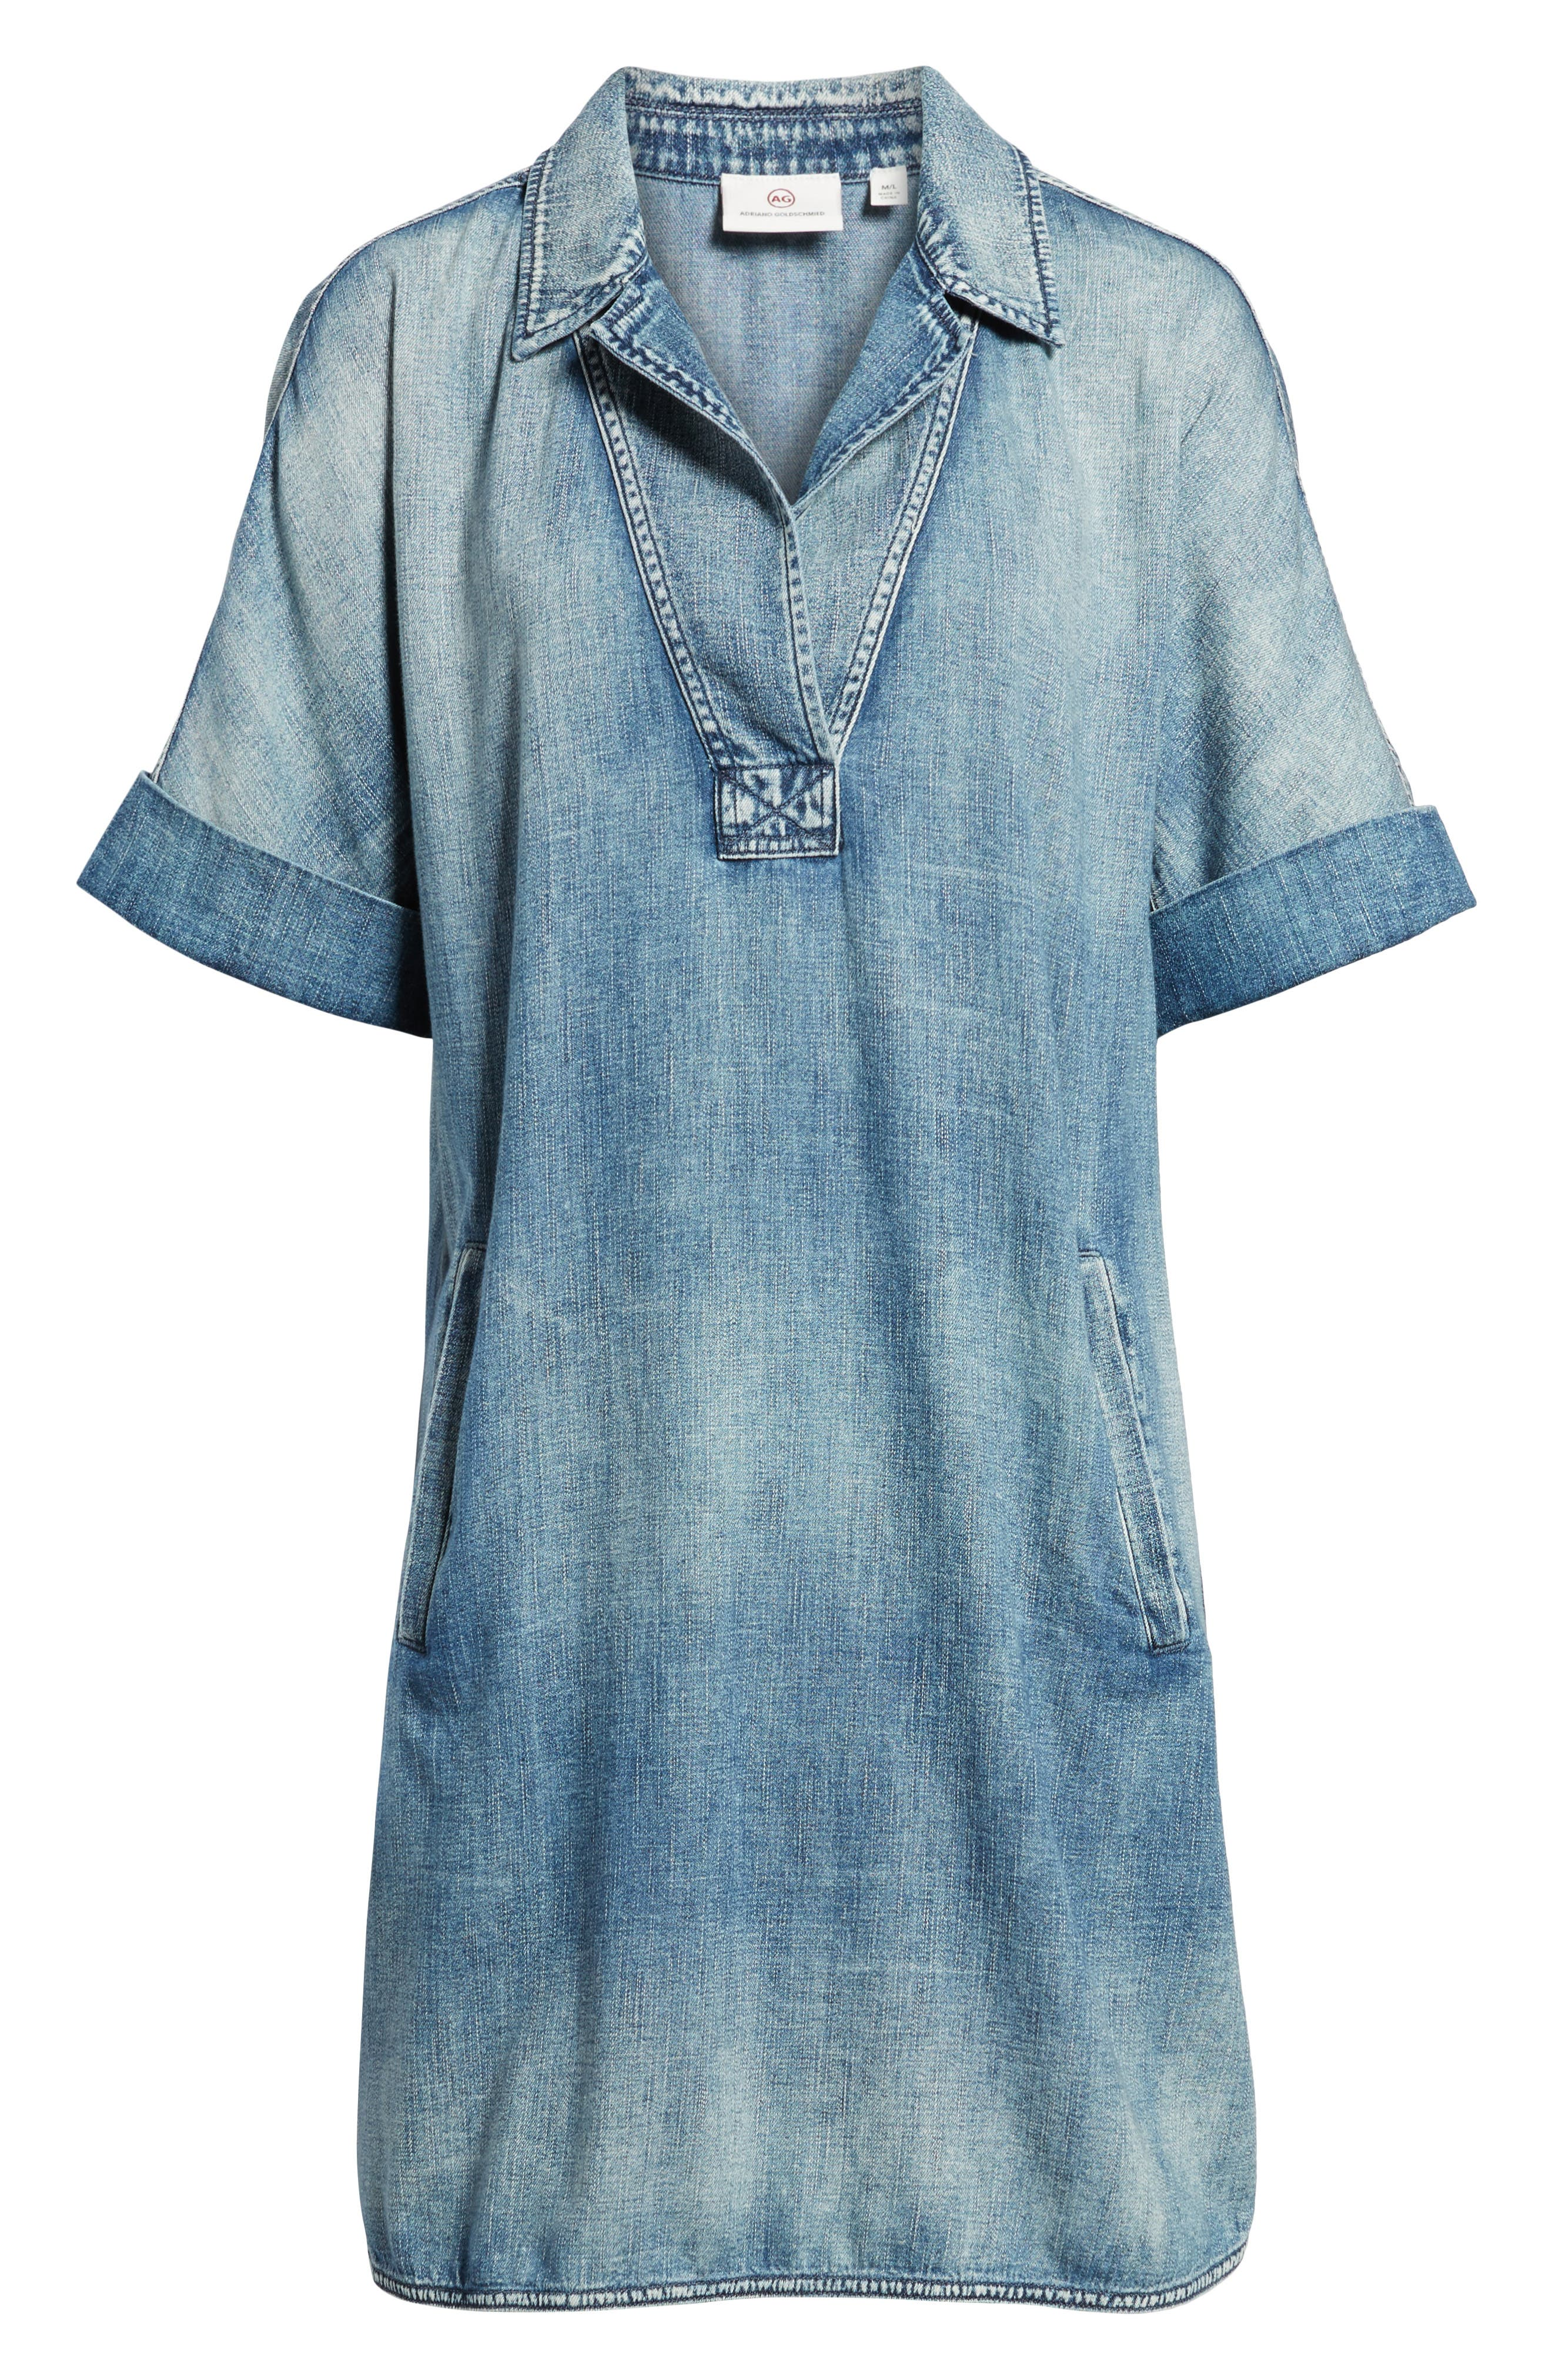 Amanda Denim Shift Dress,                             Alternate thumbnail 6, color,                             Pebble Shore